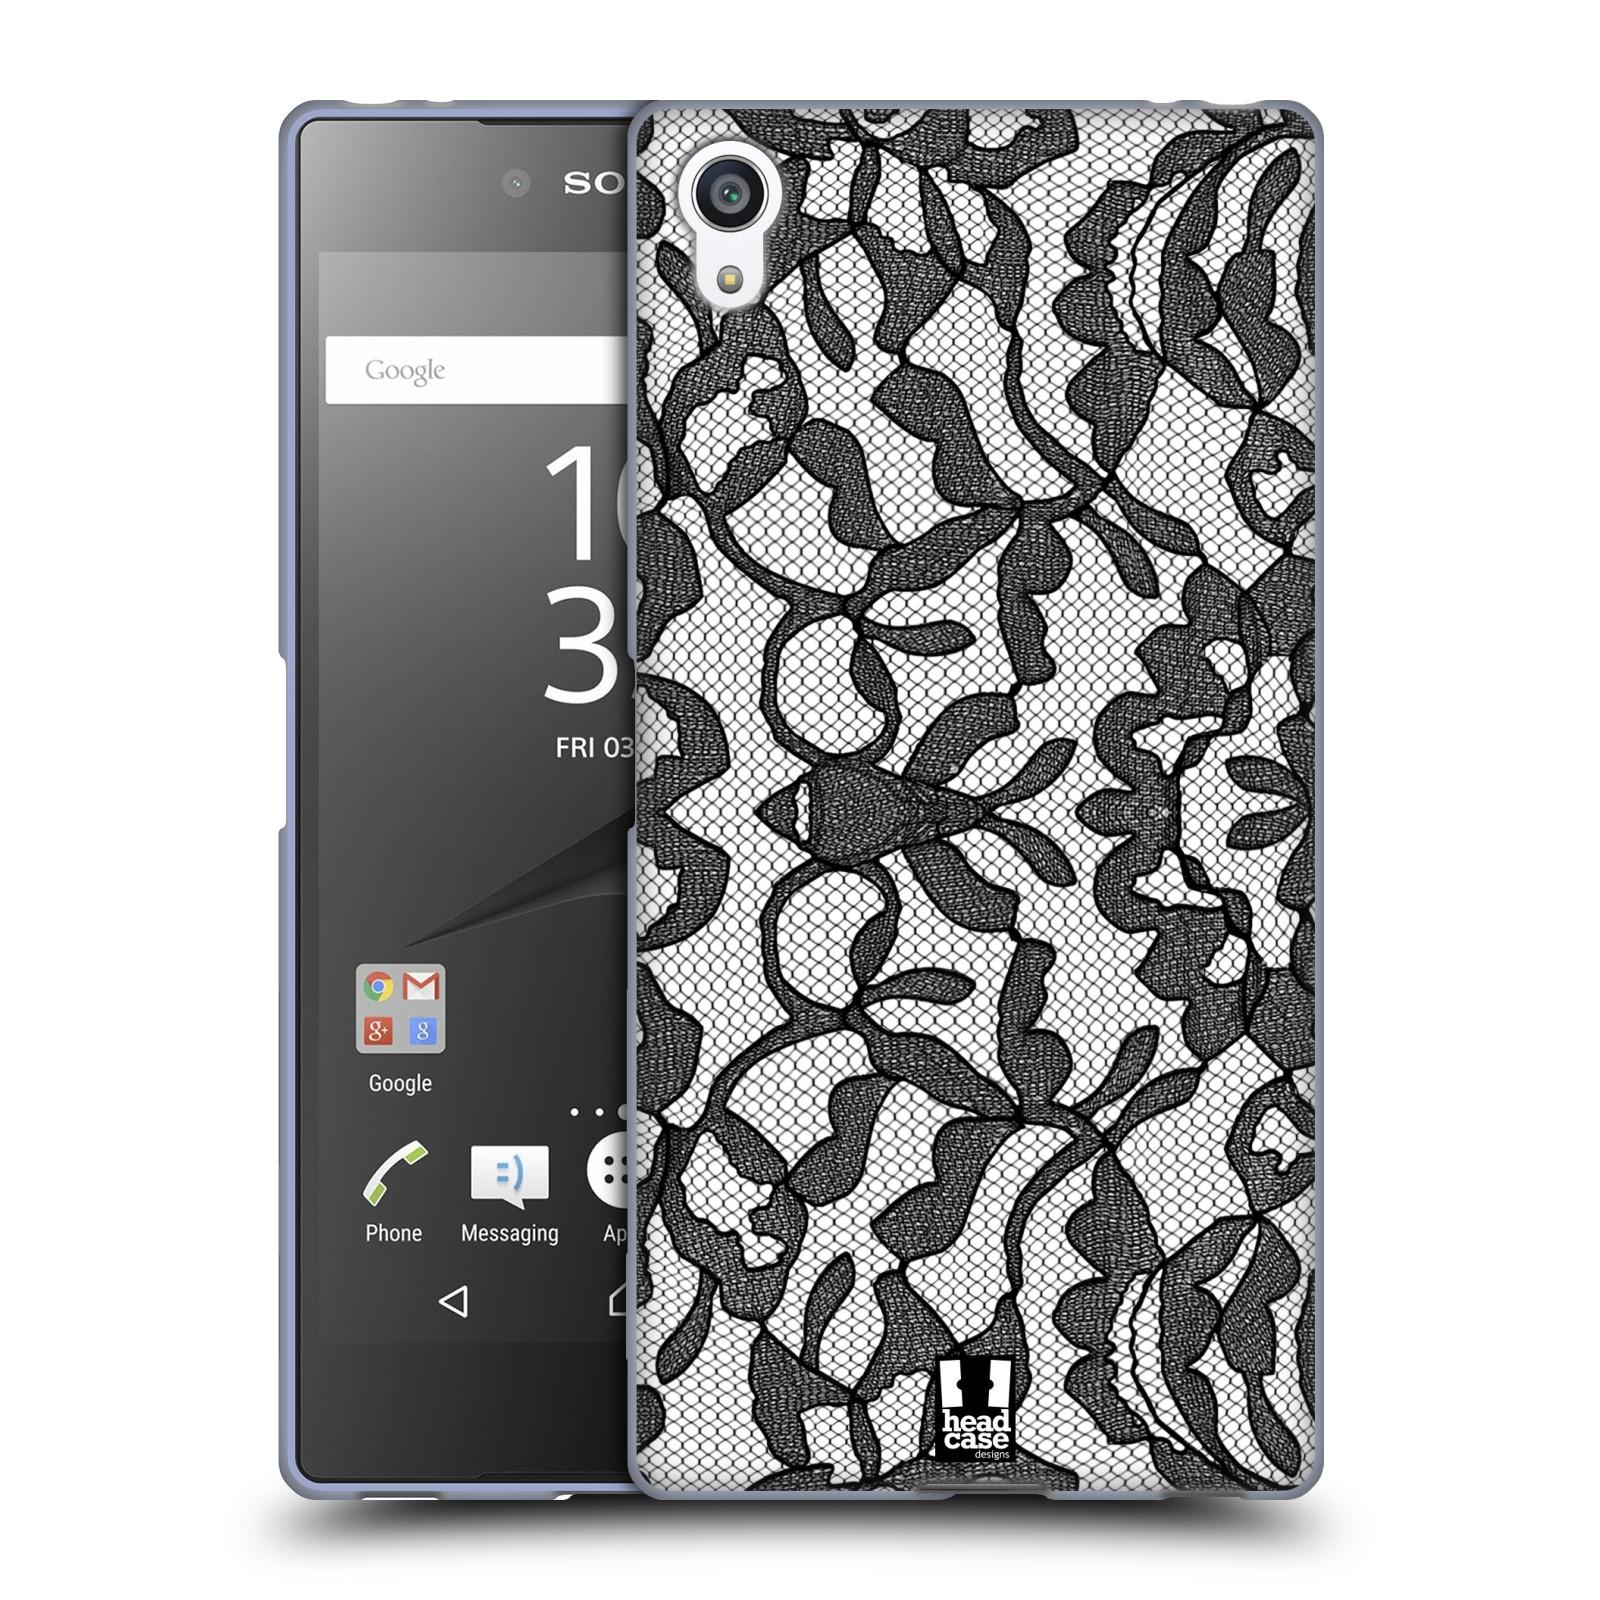 Silikonové pouzdro na mobil Sony Xperia Z5 Premium HEAD CASE LEAFY KRAJKA